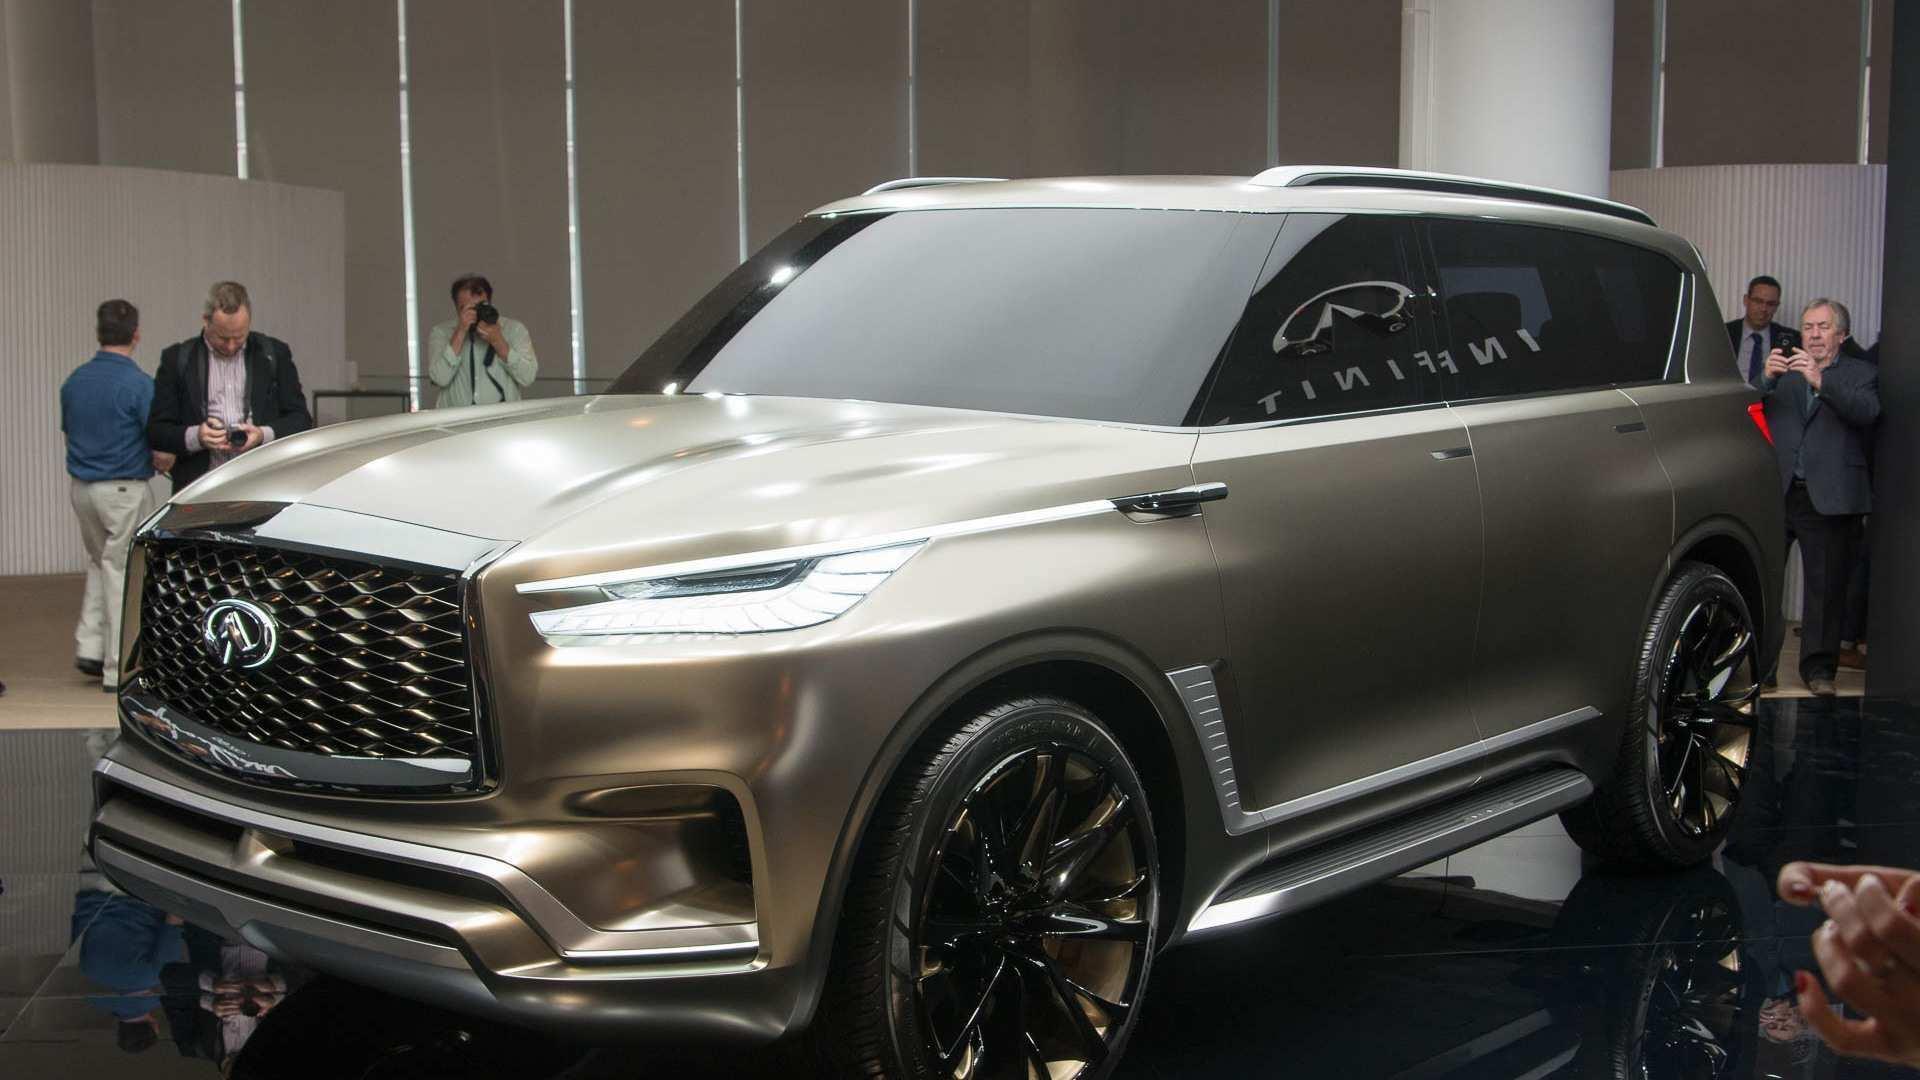 14 Concept of 2020 Infiniti QX80 Style by 2020 Infiniti QX80